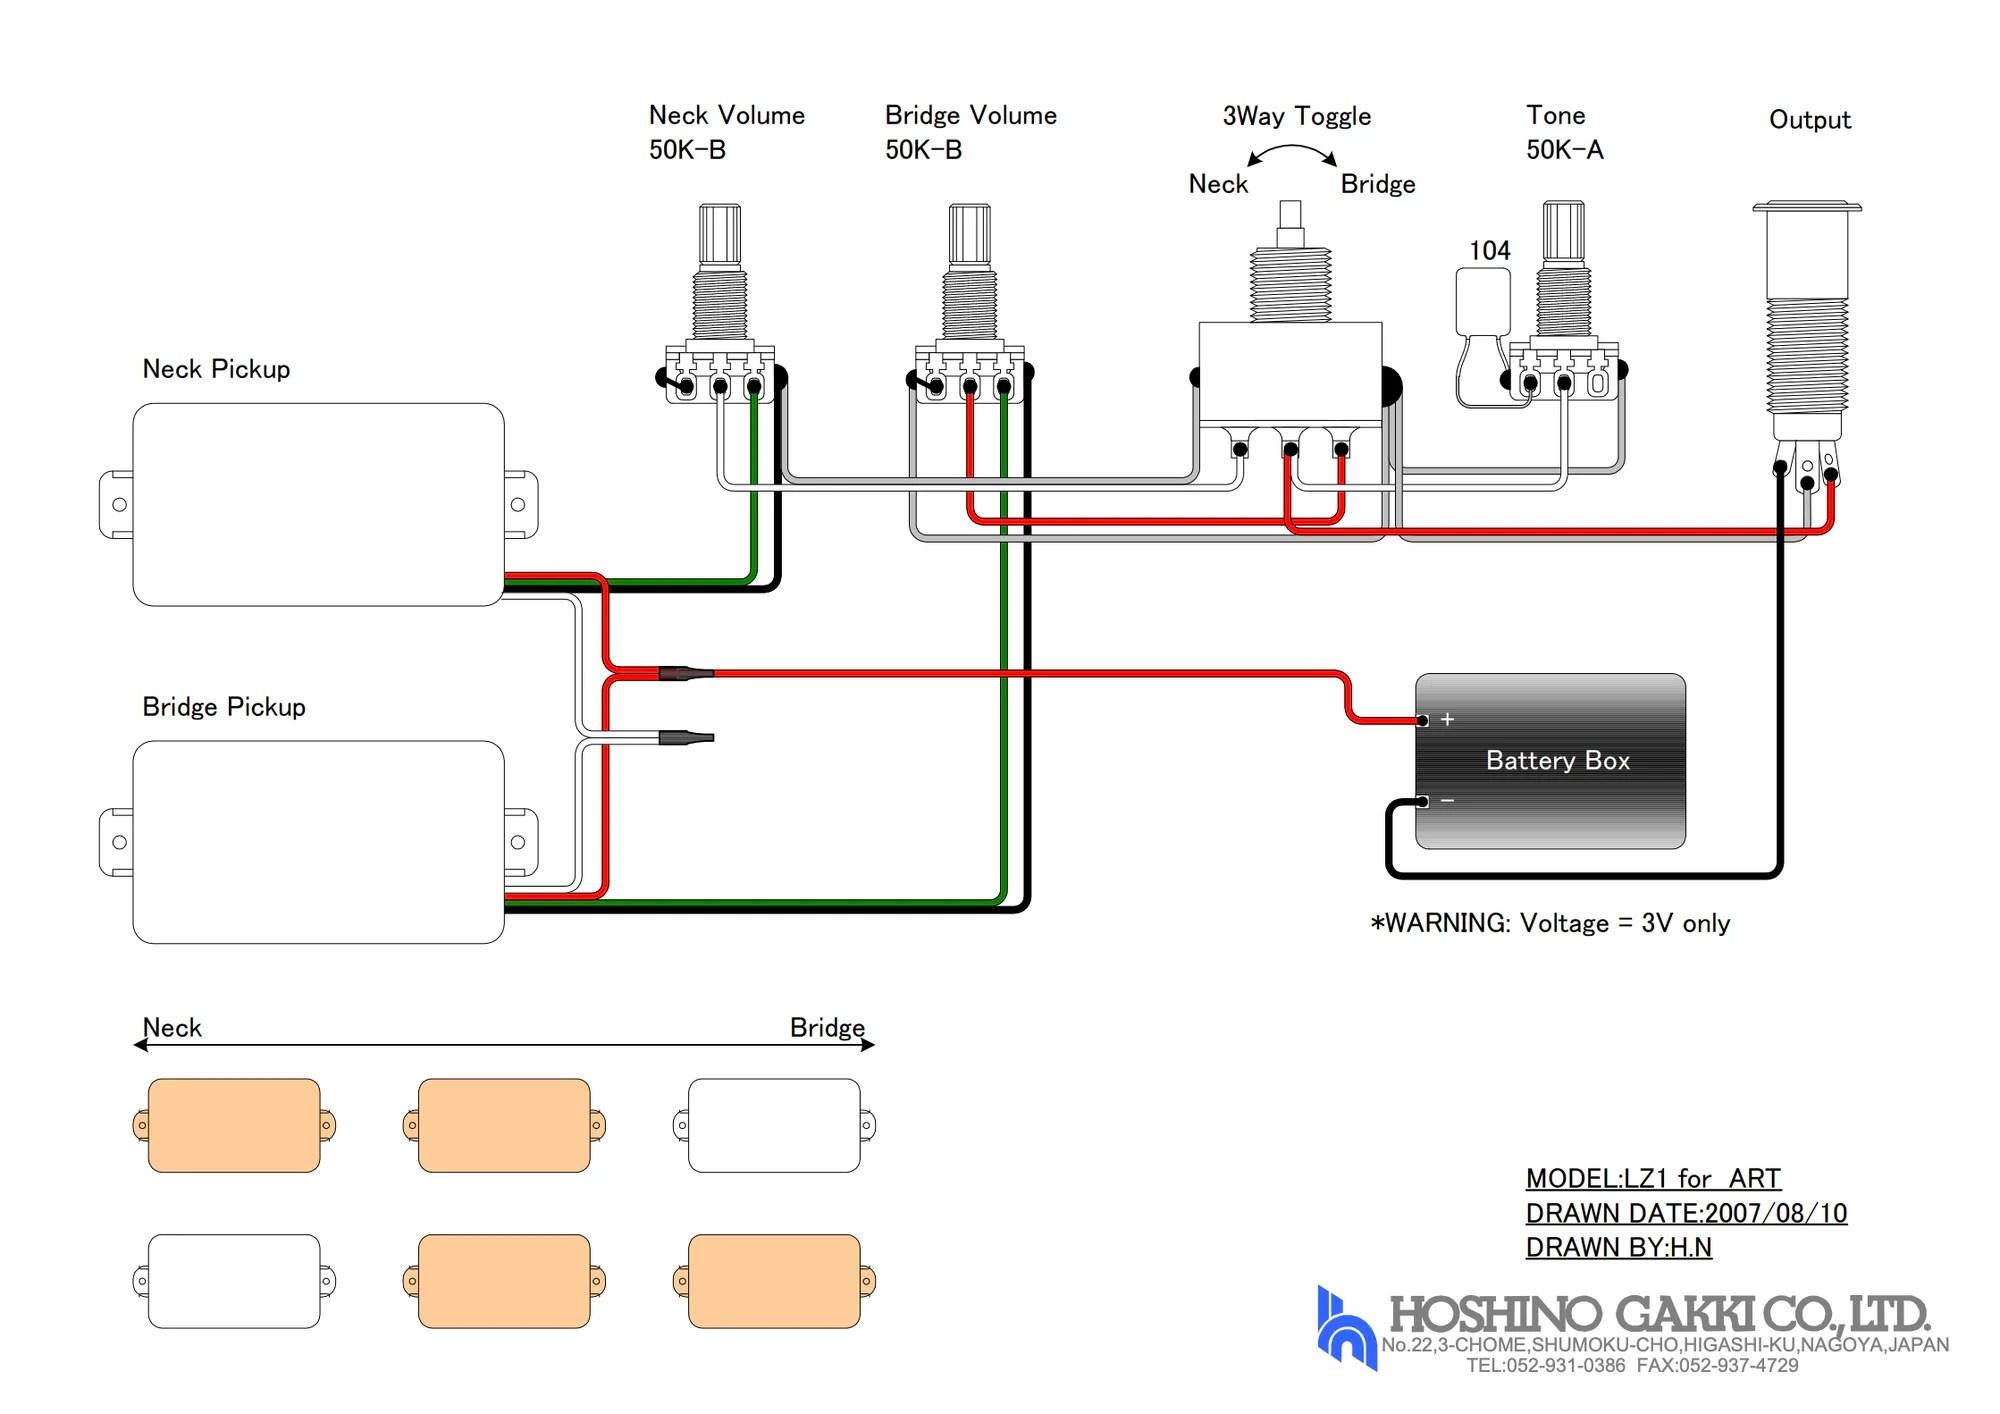 medium resolution of humbucker wiring diagram 320 art wiring diagram valueart 320 humbucker wiring diagram wiring diagram sessions art